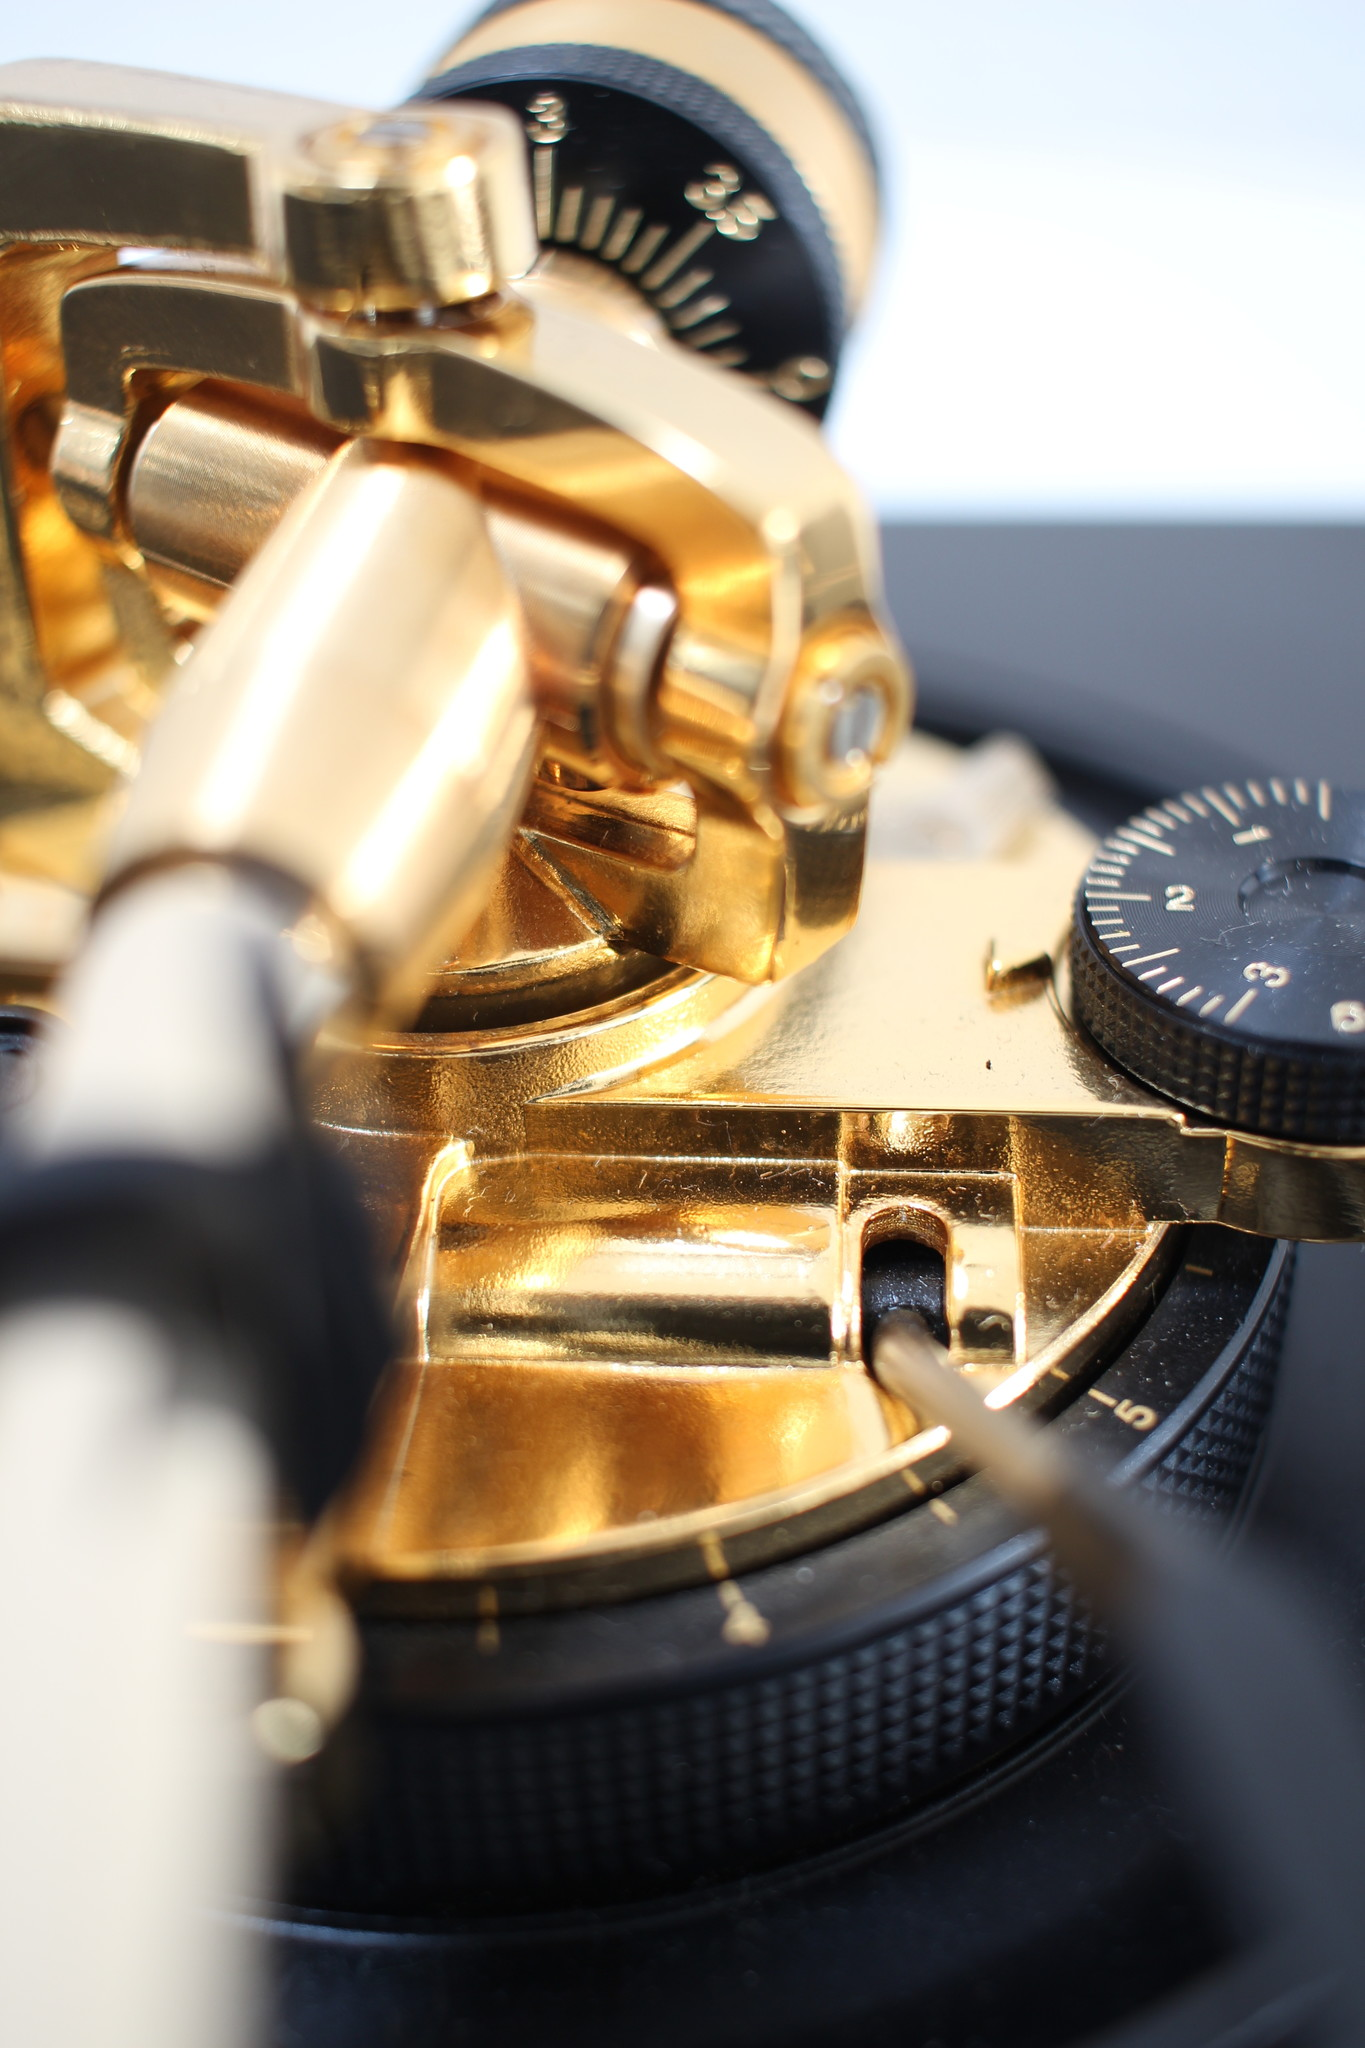 Technics SL1200 LTD set Limited edition gold